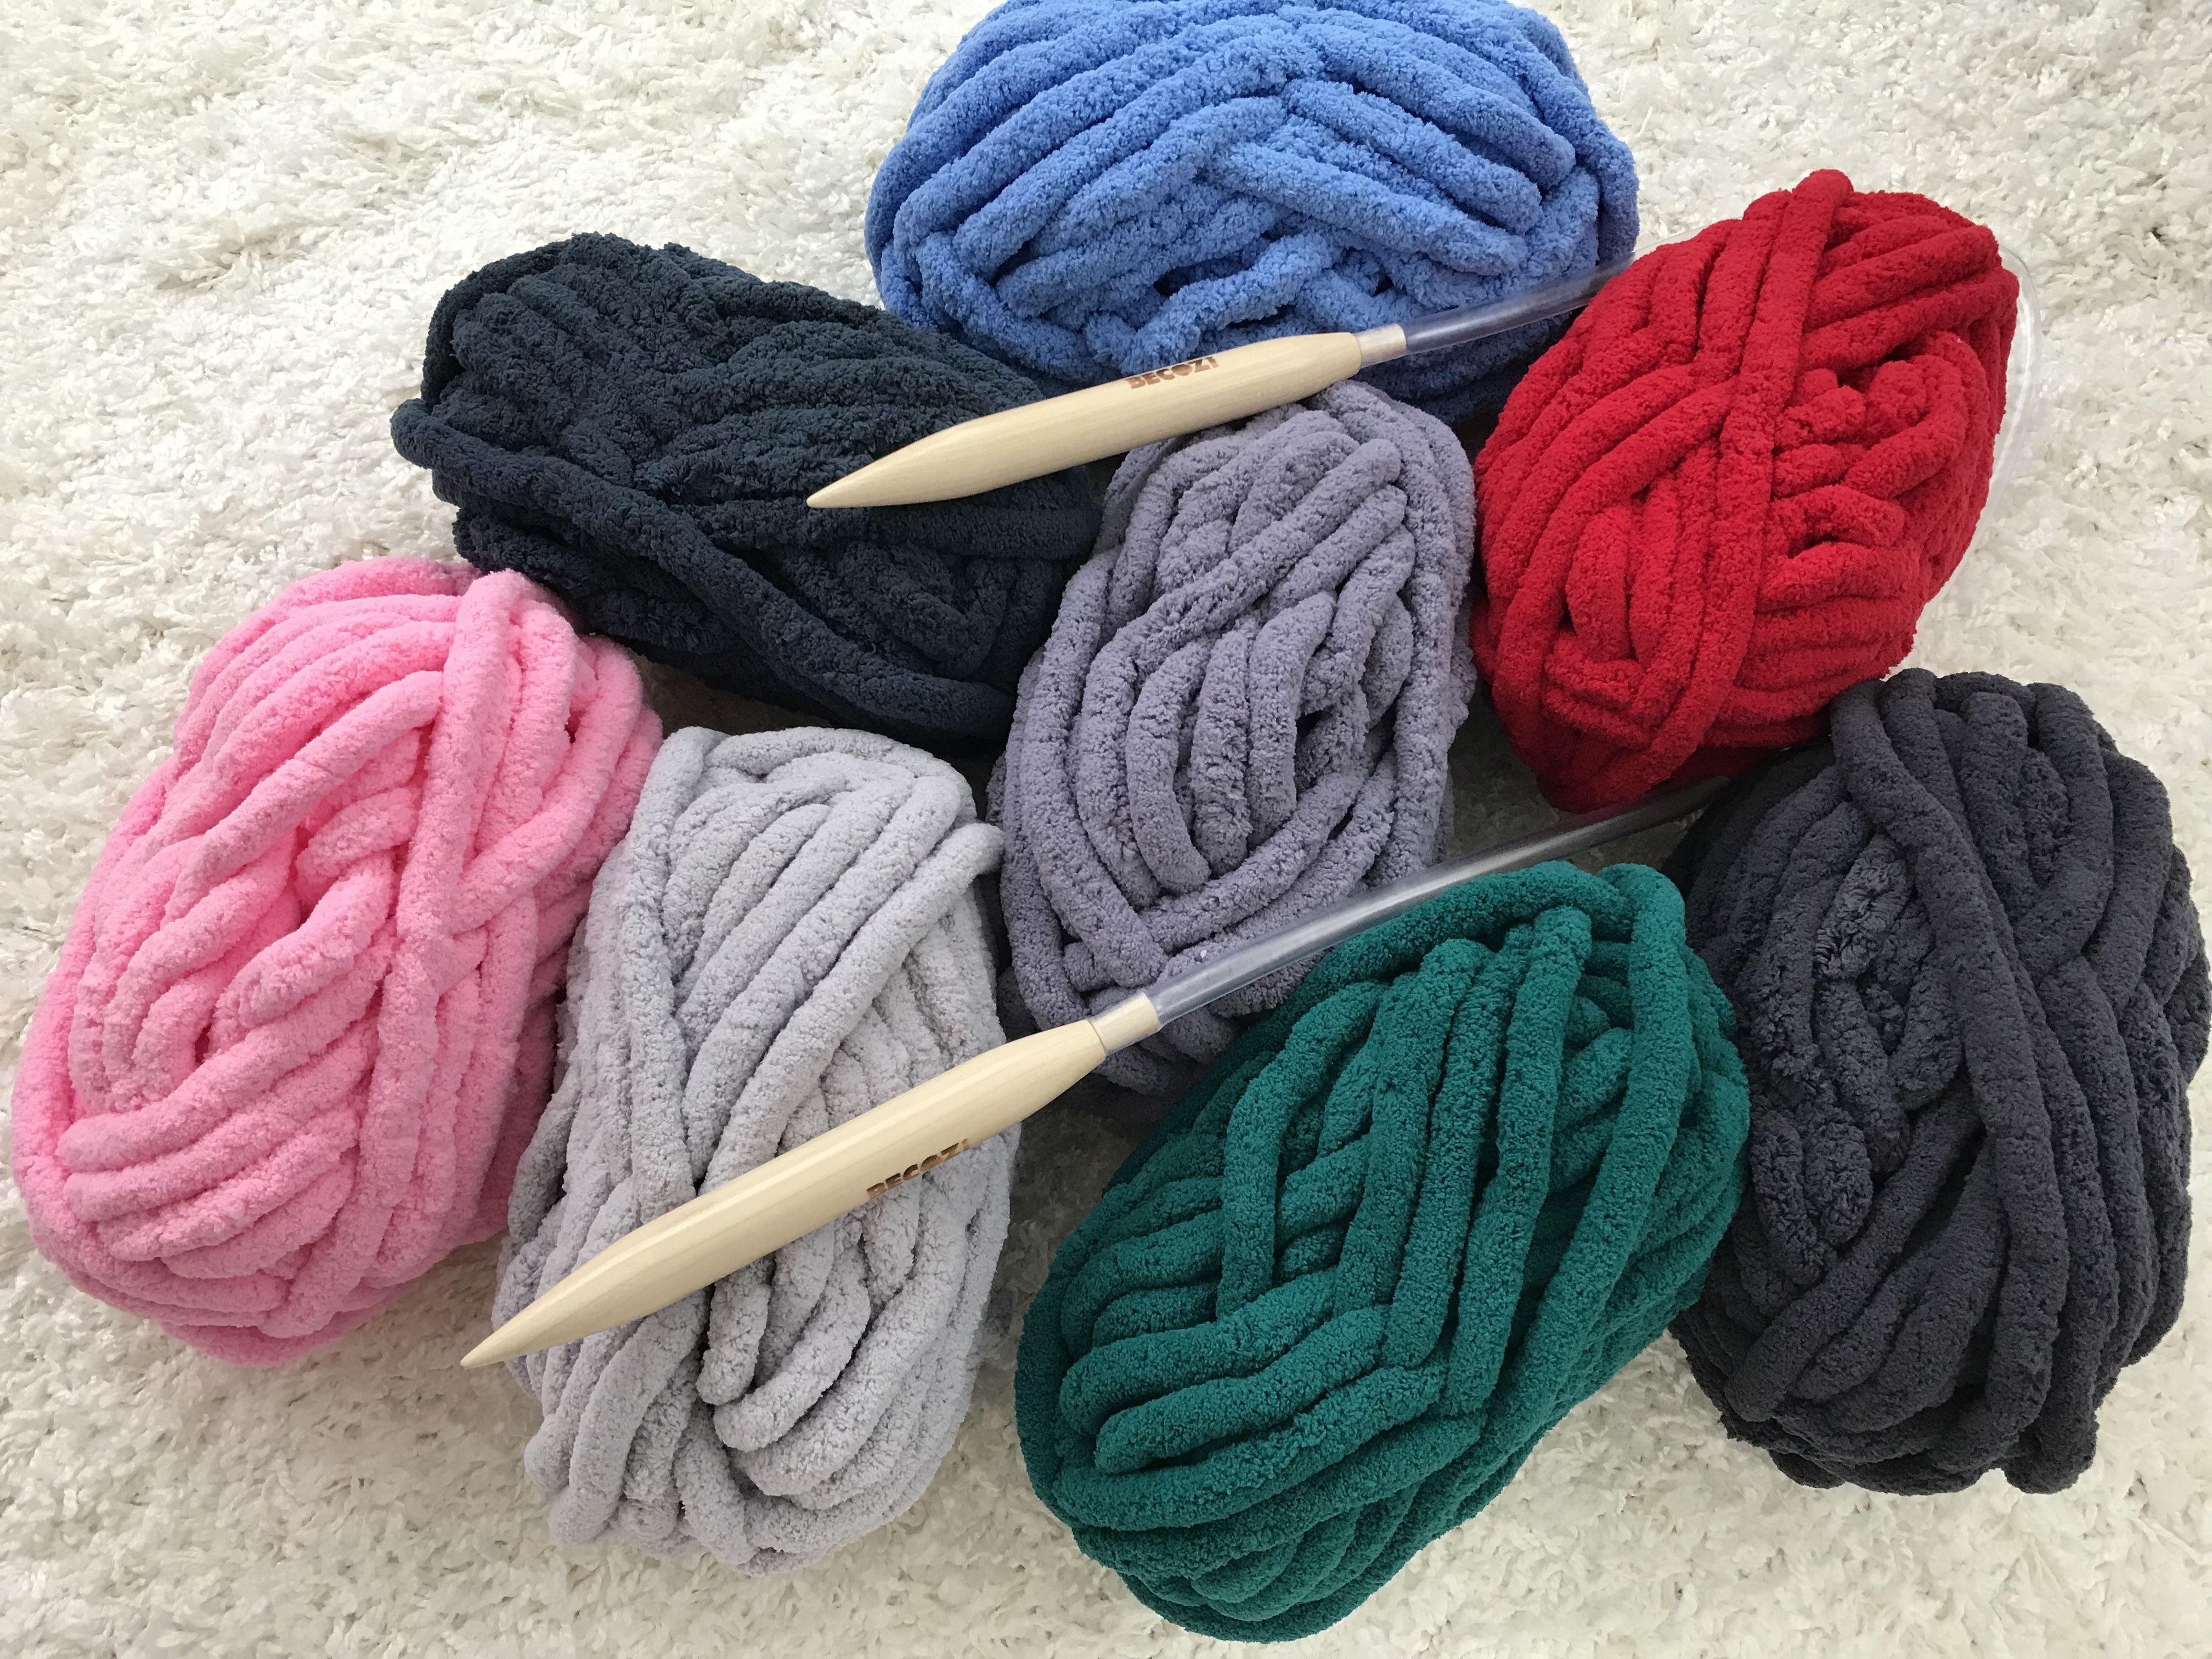 BeCozi chunky chenille yarn, 24 colors available! Arm